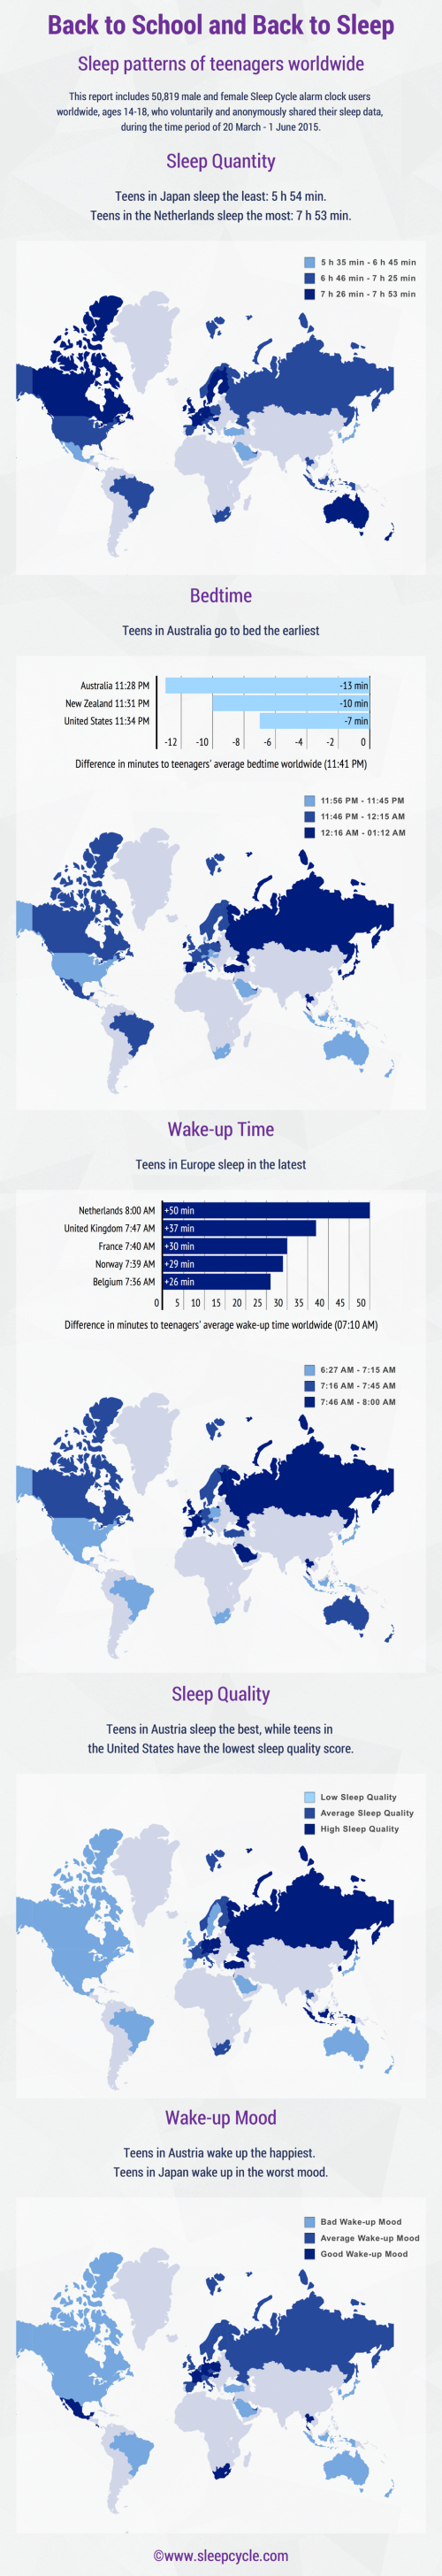 Sleep Cycle Worldwide Teens Sleep